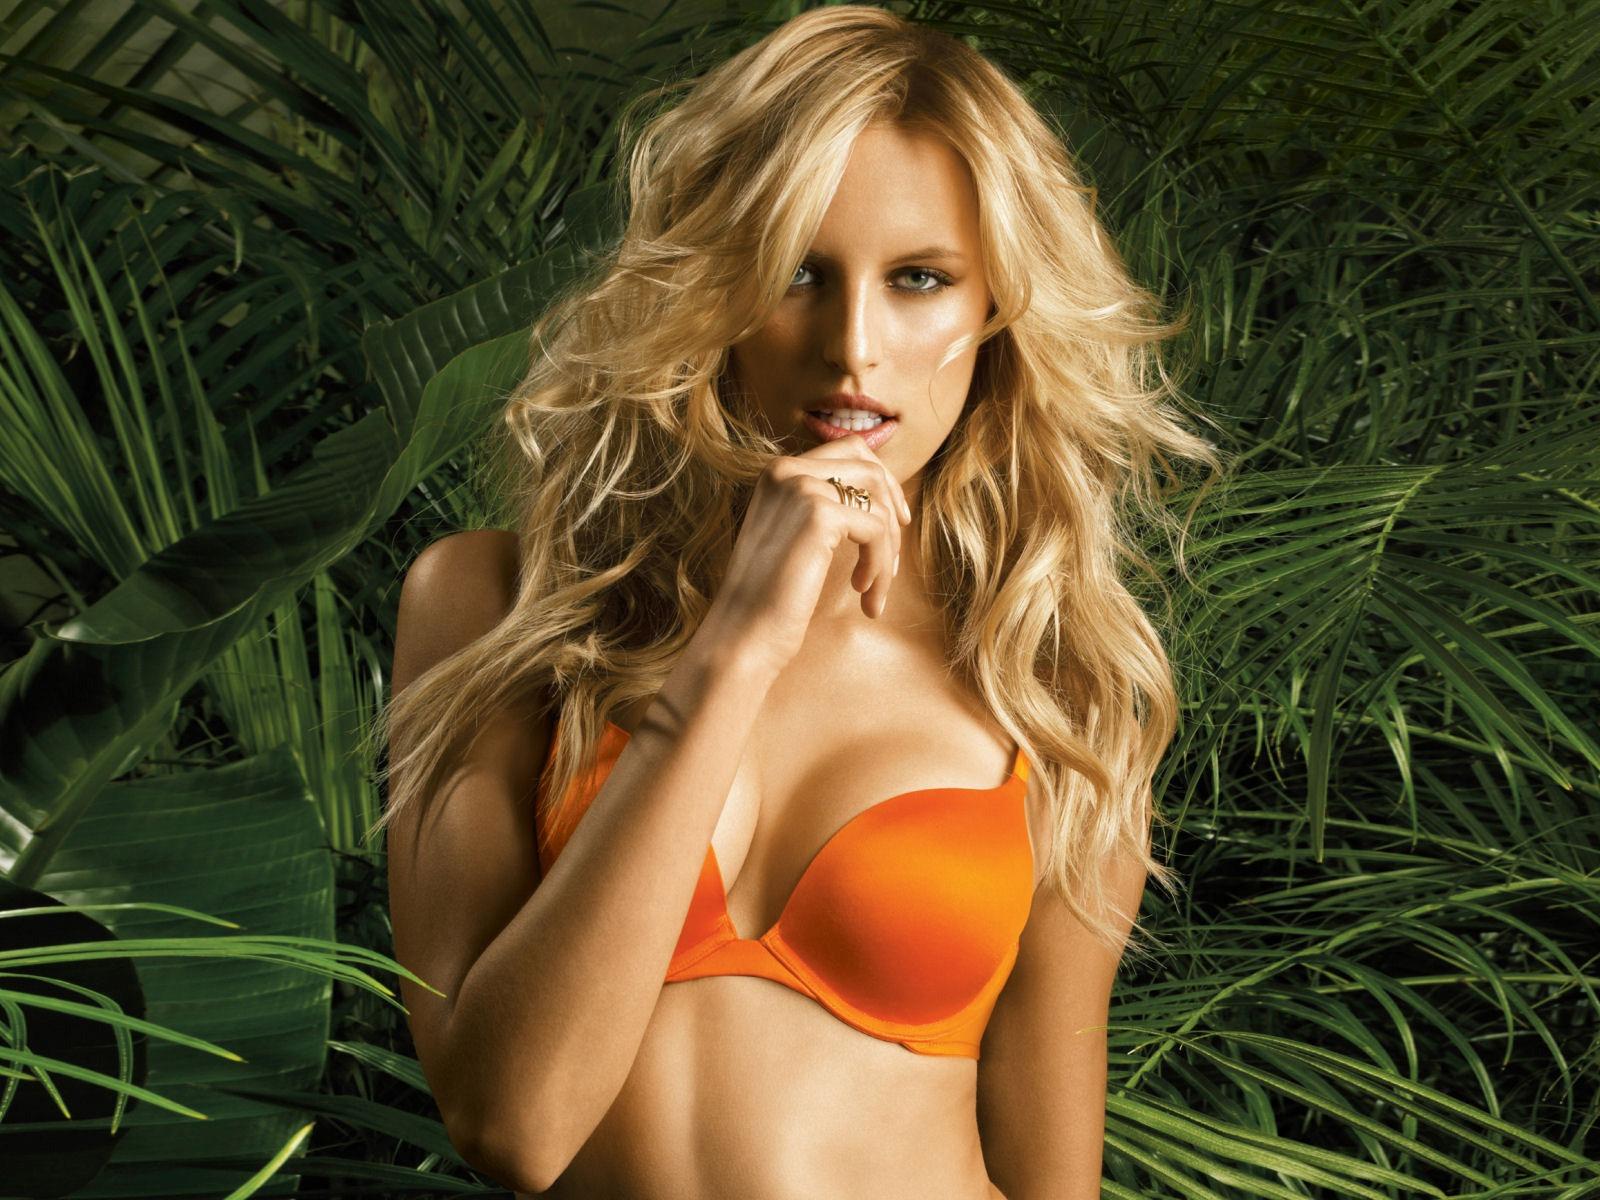 http://4.bp.blogspot.com/--4EVfM1iSGY/TiO7VtT0DXI/AAAAAAAAEdI/u19p0ZXQPGc/s1600/karolina_kurkova-model-fashion%2Bstyle.jpg